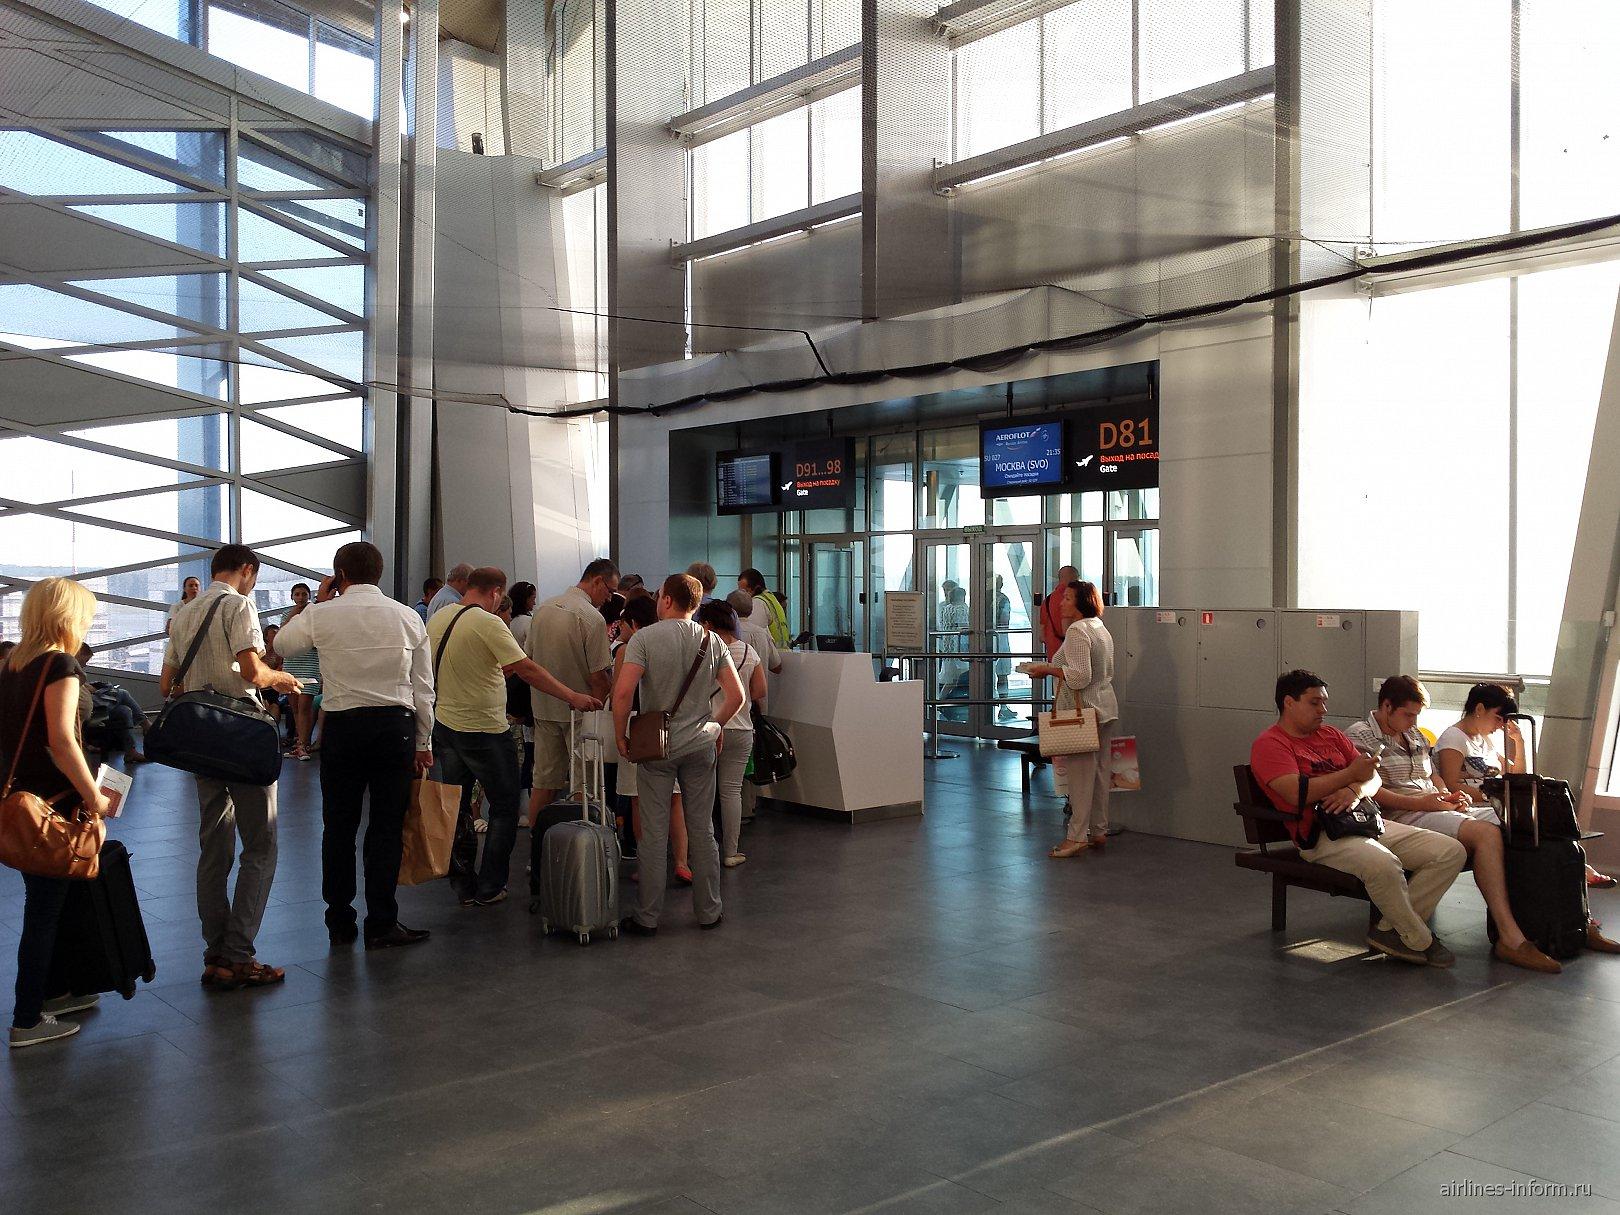 Выход на посадку в новом терминале аэропорта Пулково